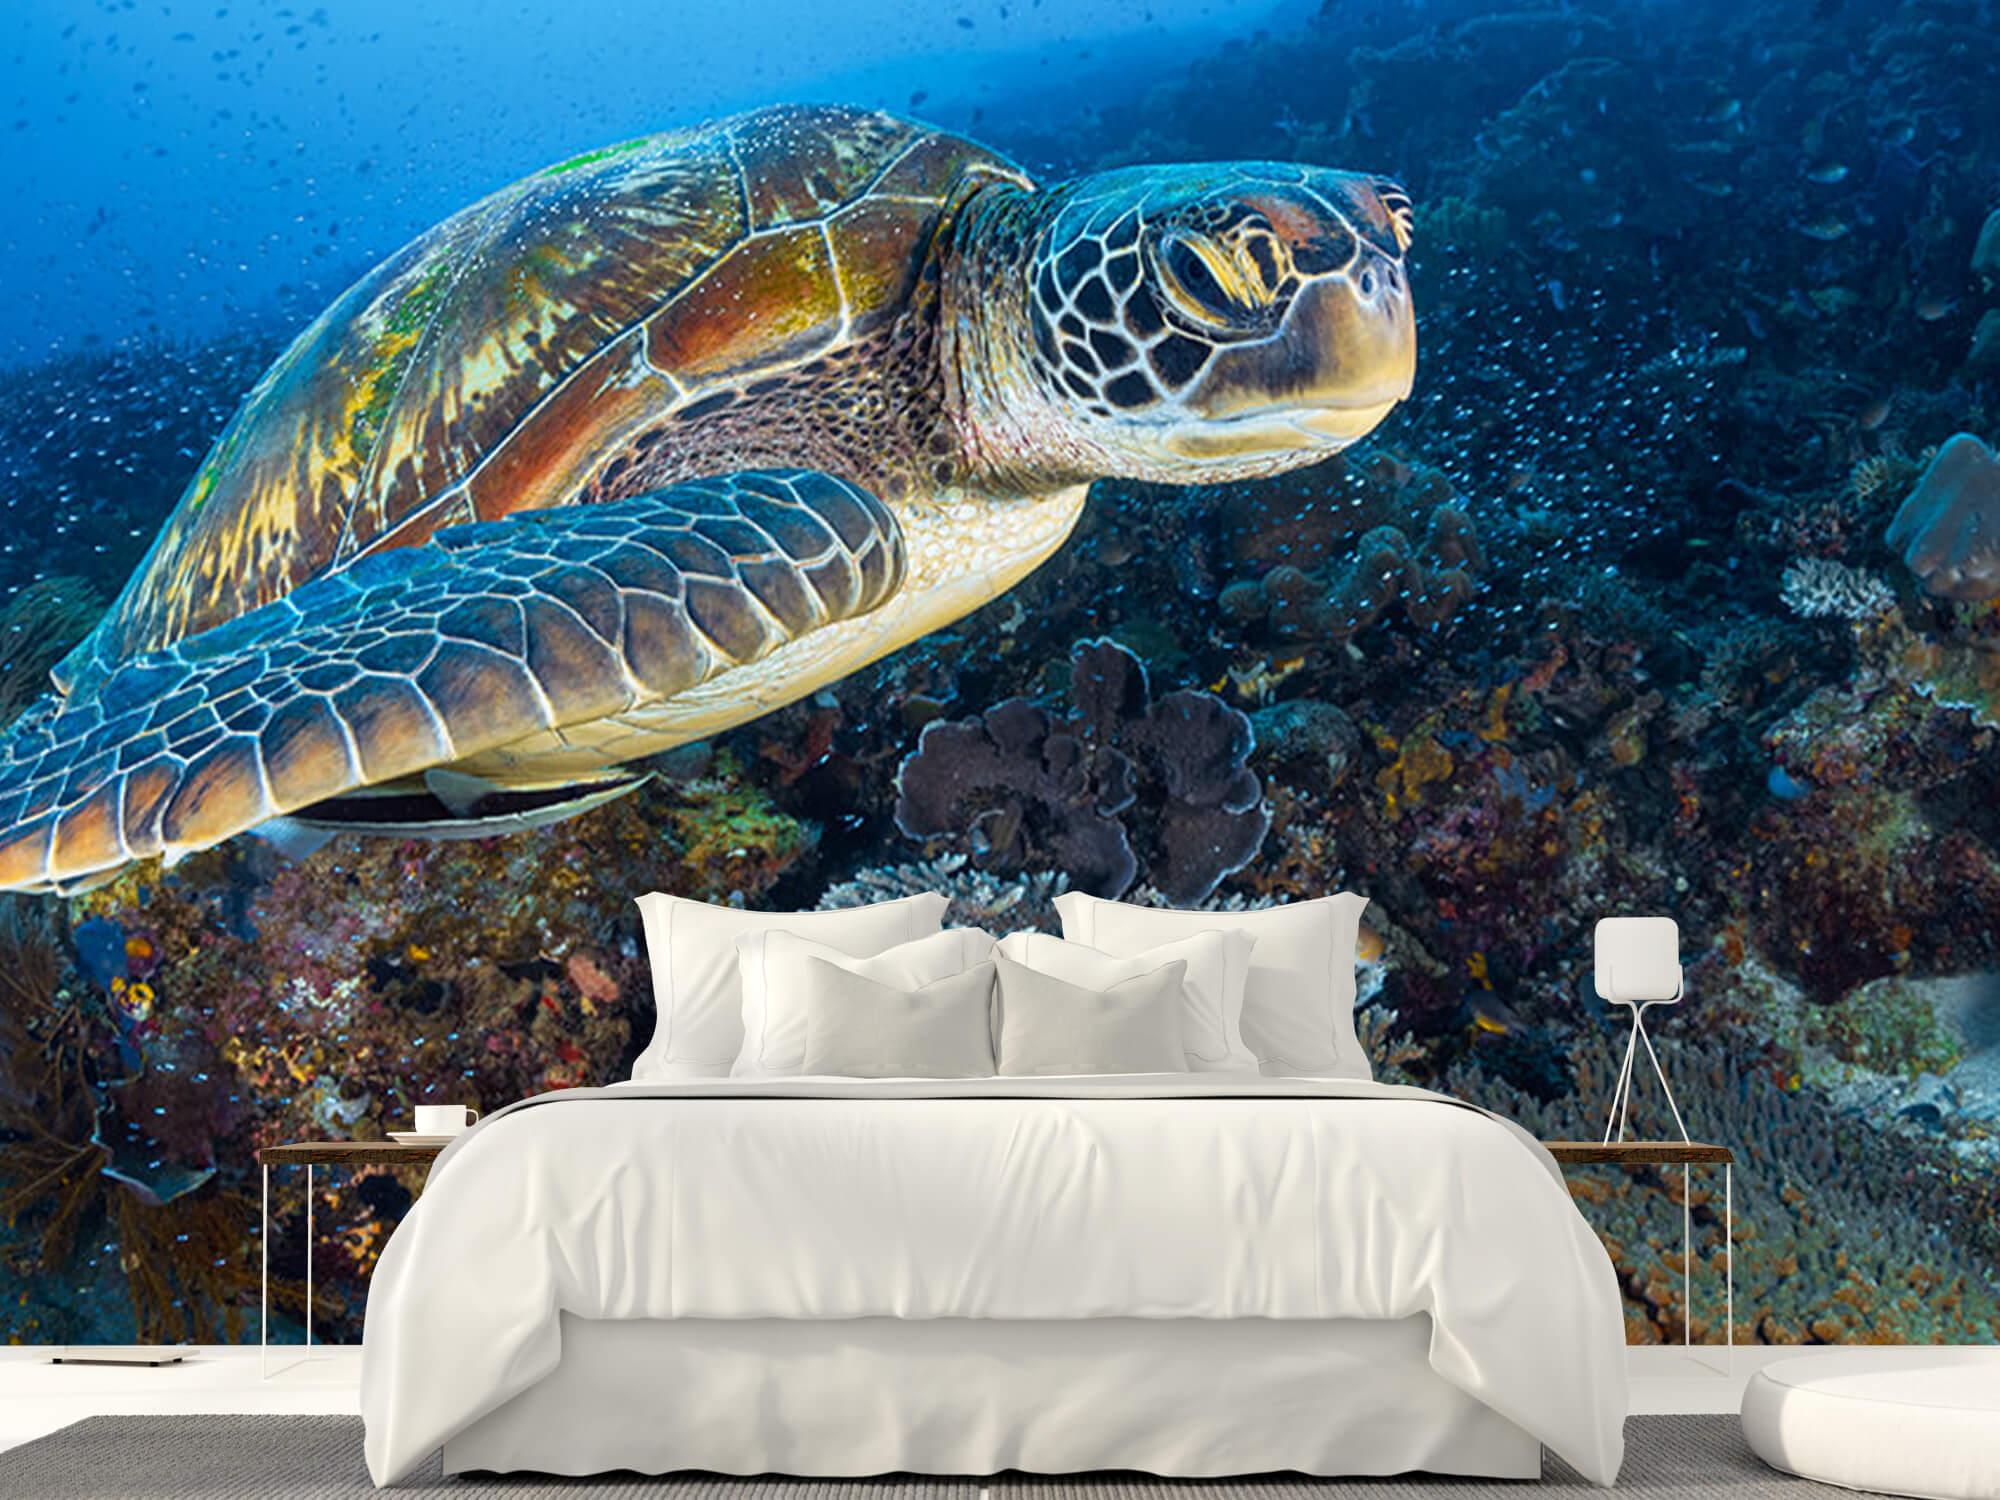 Green sea turtle from Raja Ampat 11